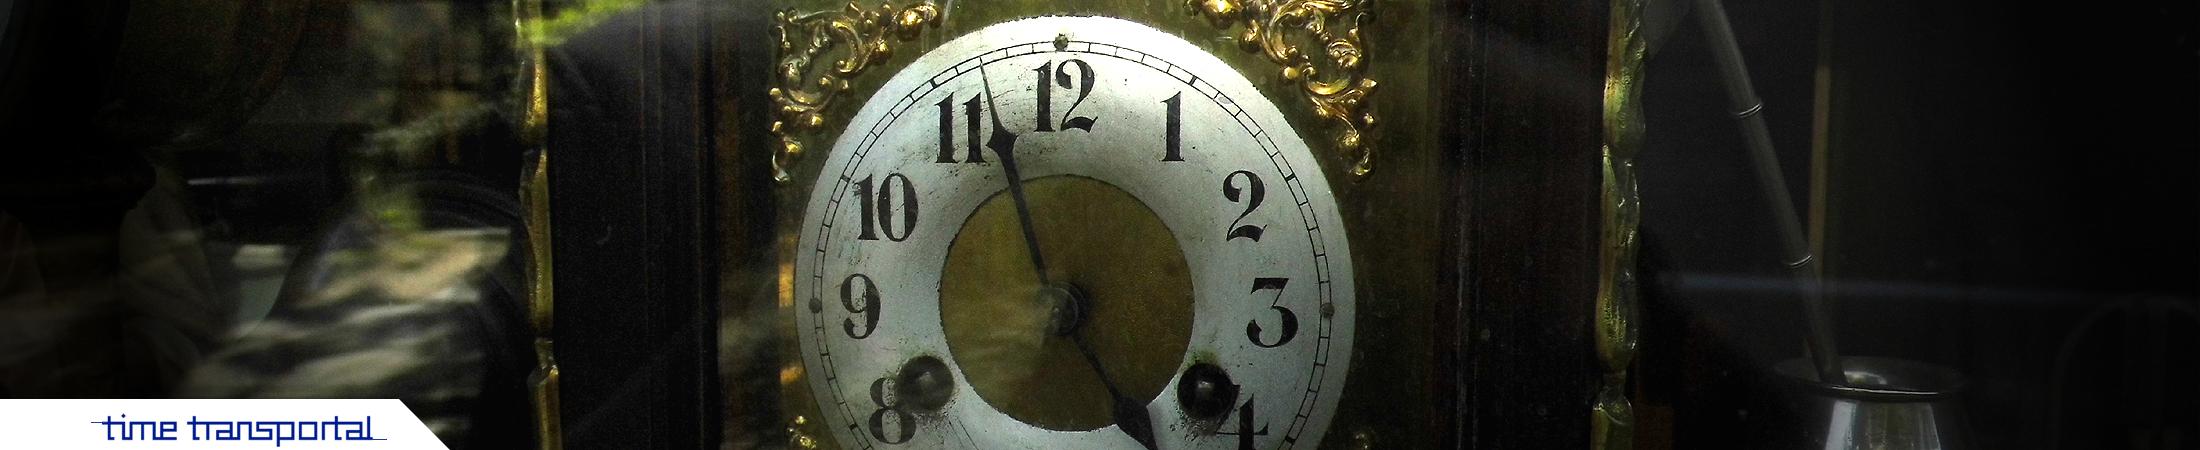 header_img_2200x900px_clock